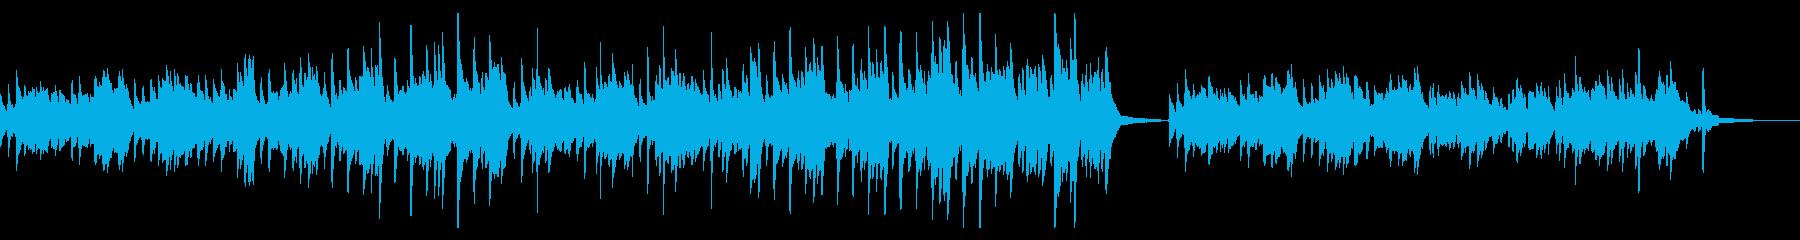 CMやVPに 癒しピアノ リラックス 森の再生済みの波形